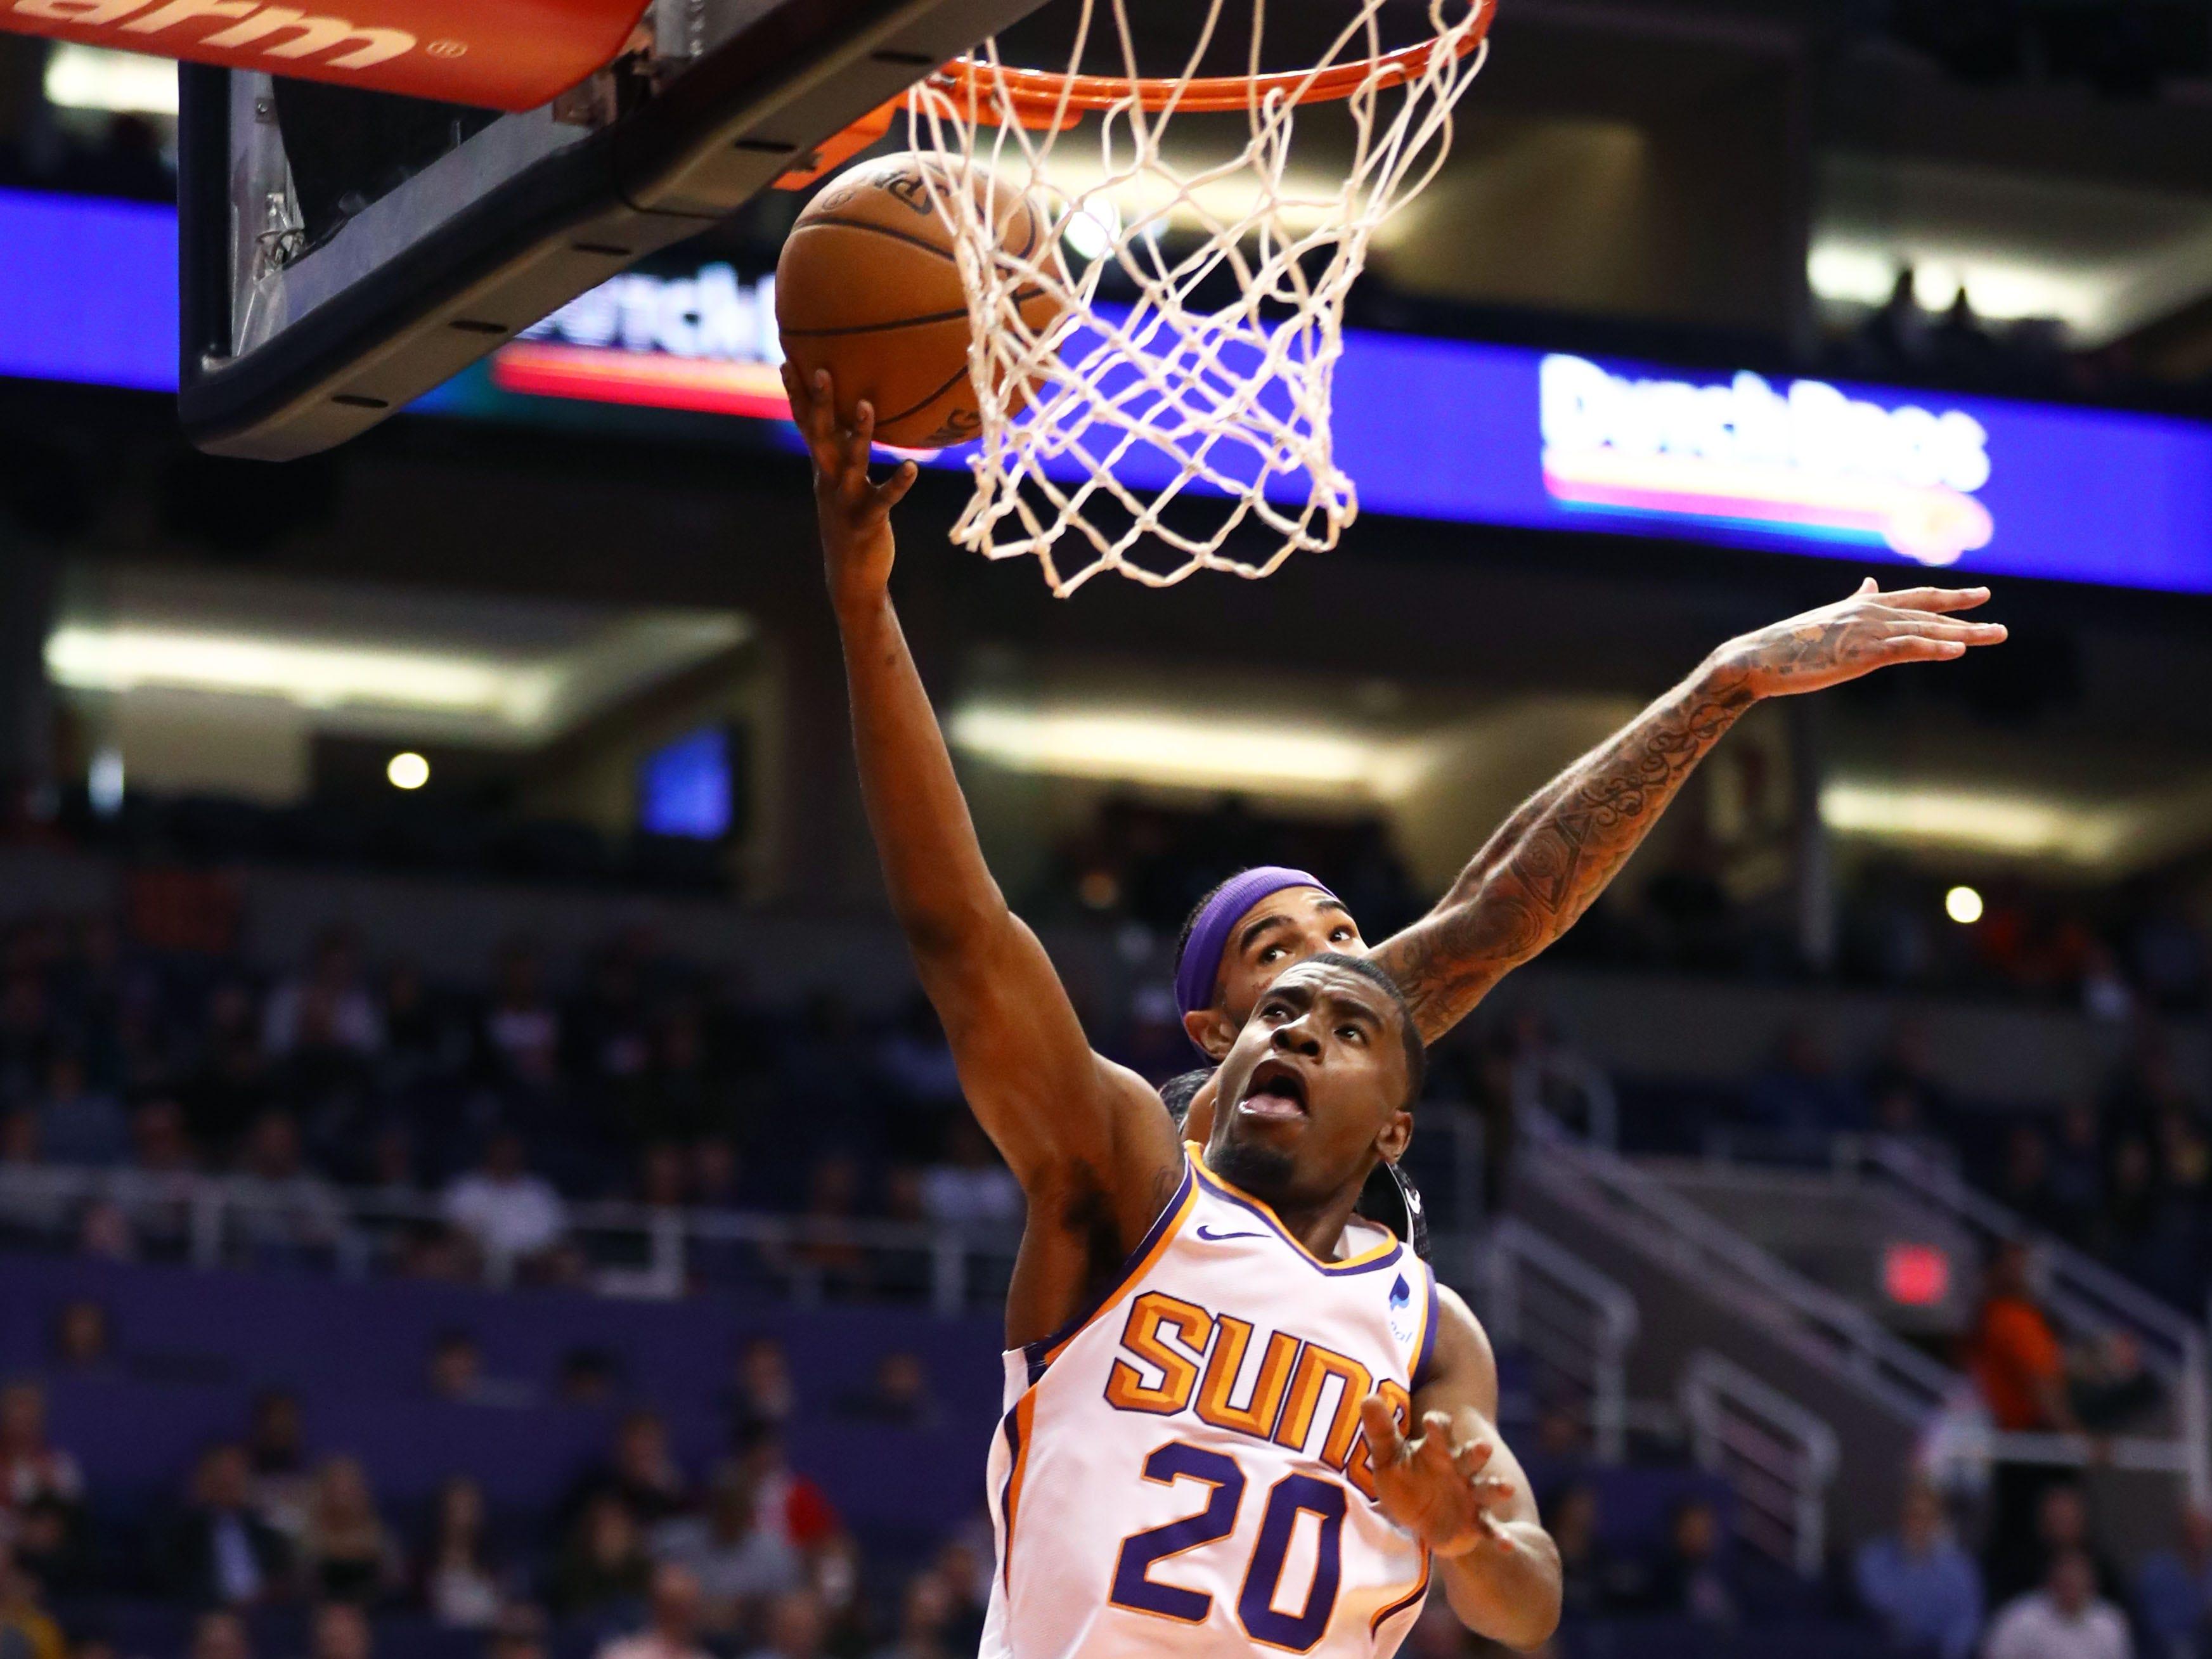 Jan 8, 2019; Phoenix, AZ, USA; Phoenix Suns forward Josh Jackson drives to the basket against the Sacramento Kings in the first half at Talking Stick Resort Arena. Mandatory Credit: Mark J. Rebilas-USA TODAY Sports